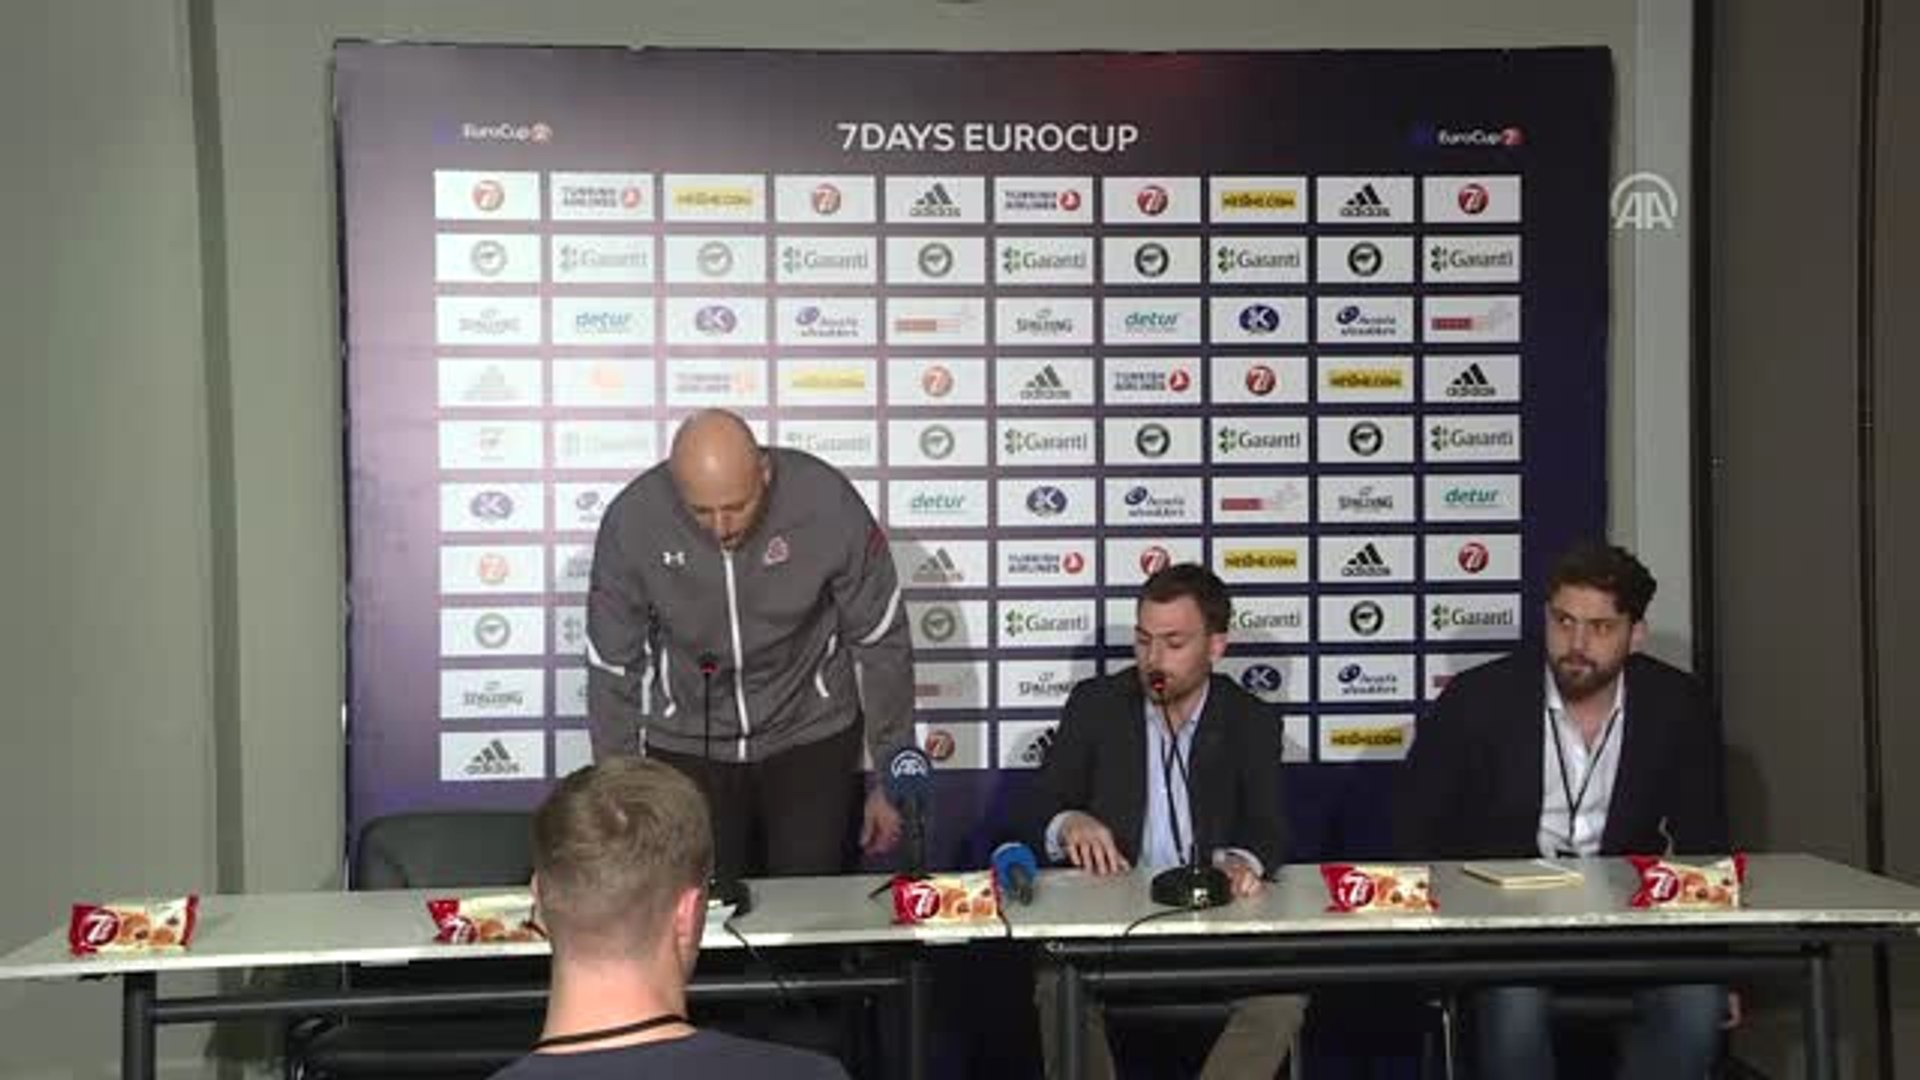 Darüşşafaka-Lokomotiv Kuban Maçının Ardından - Sasa Obradovic